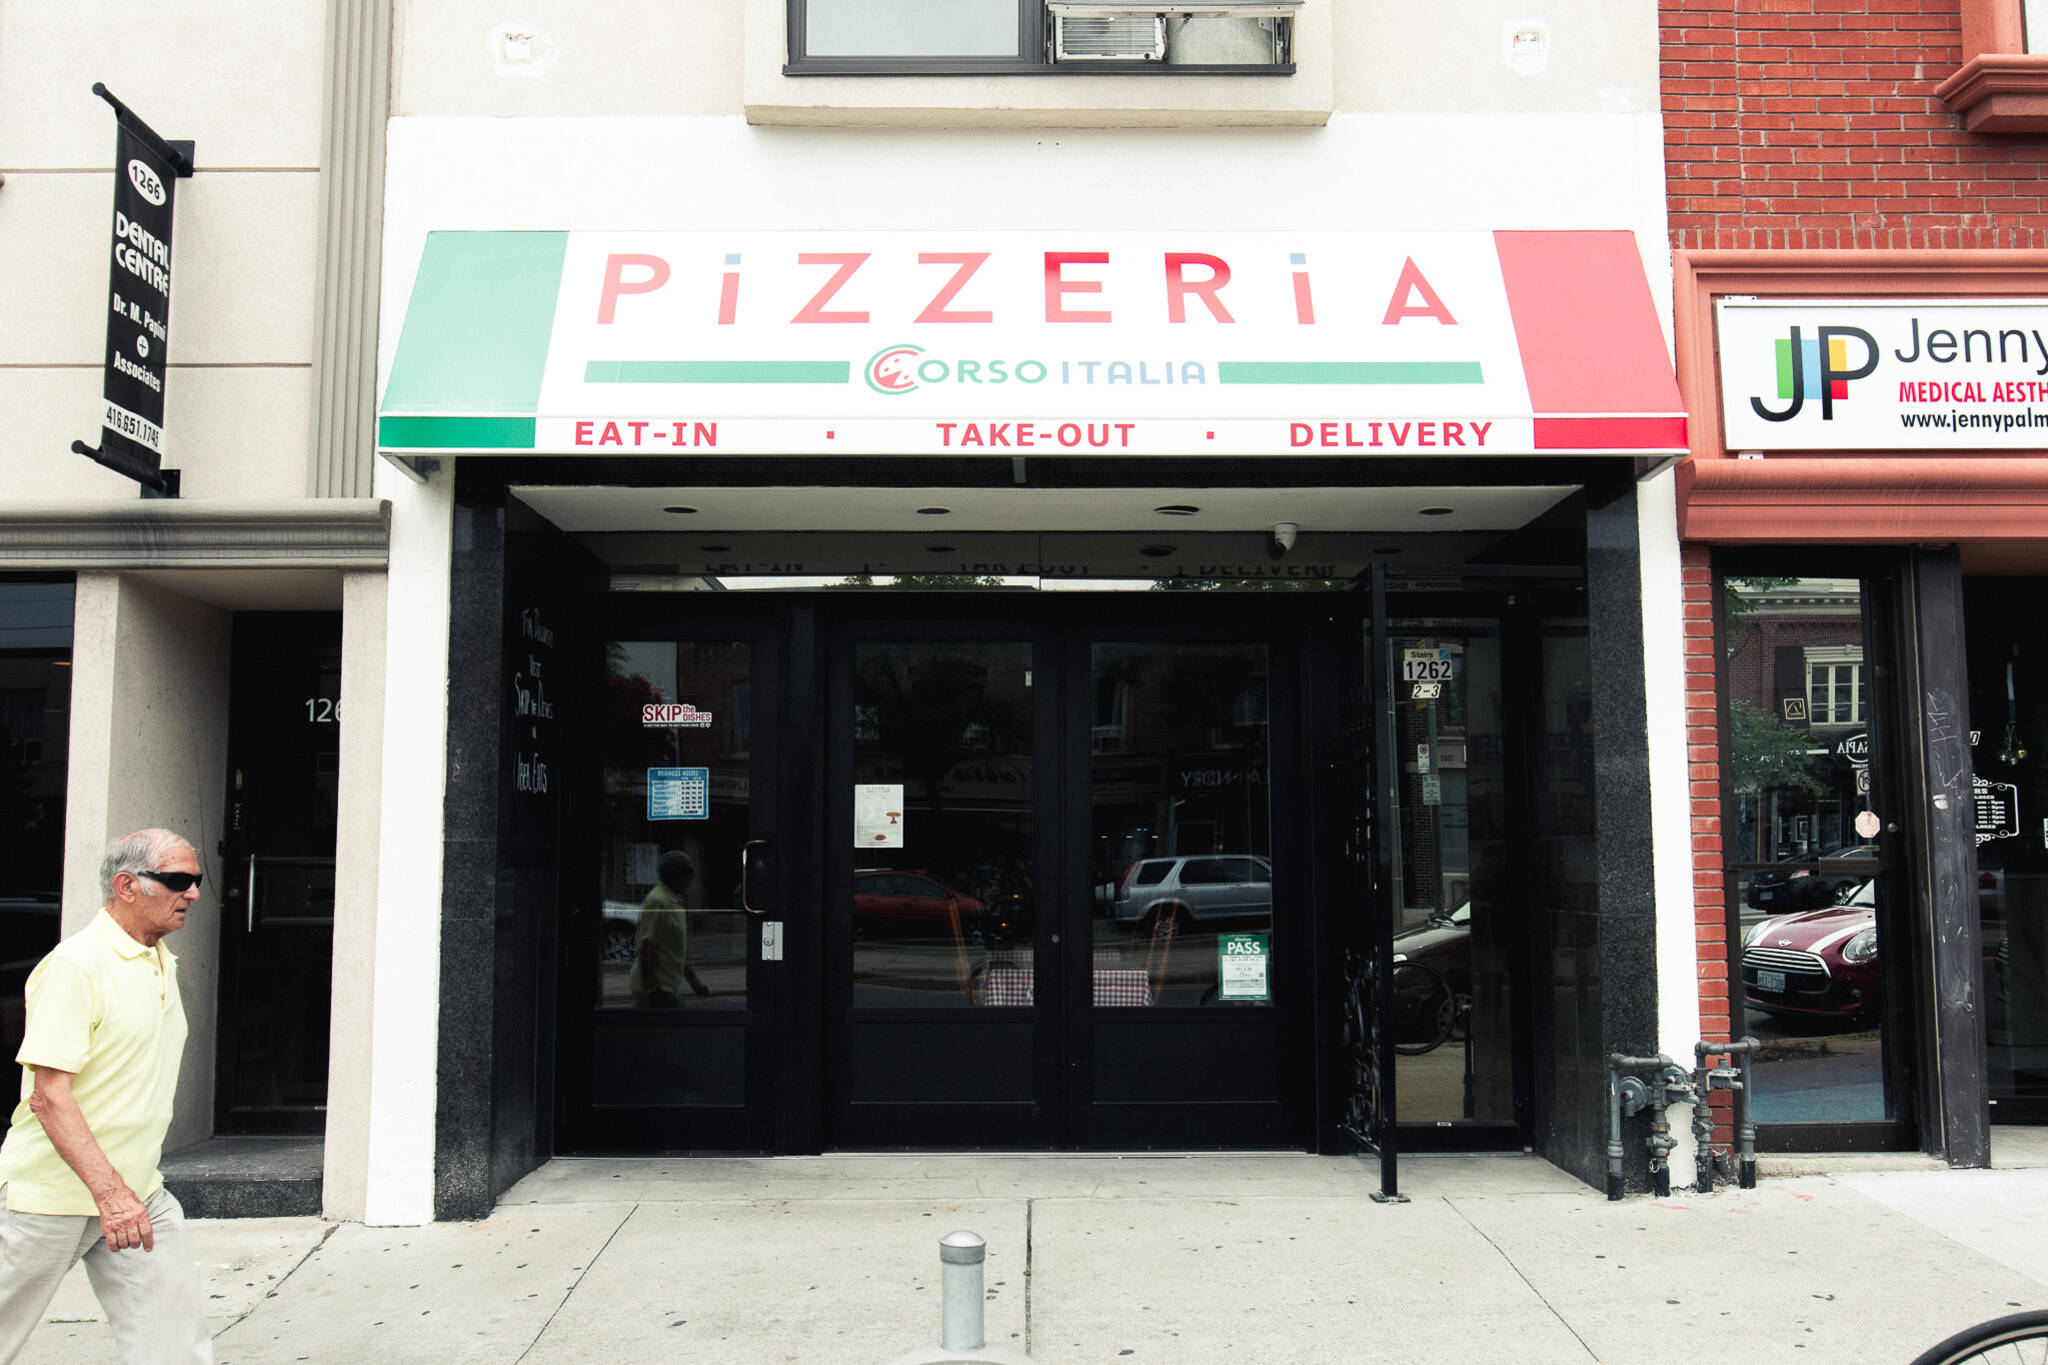 Pizzeria Corso Italia Toronto